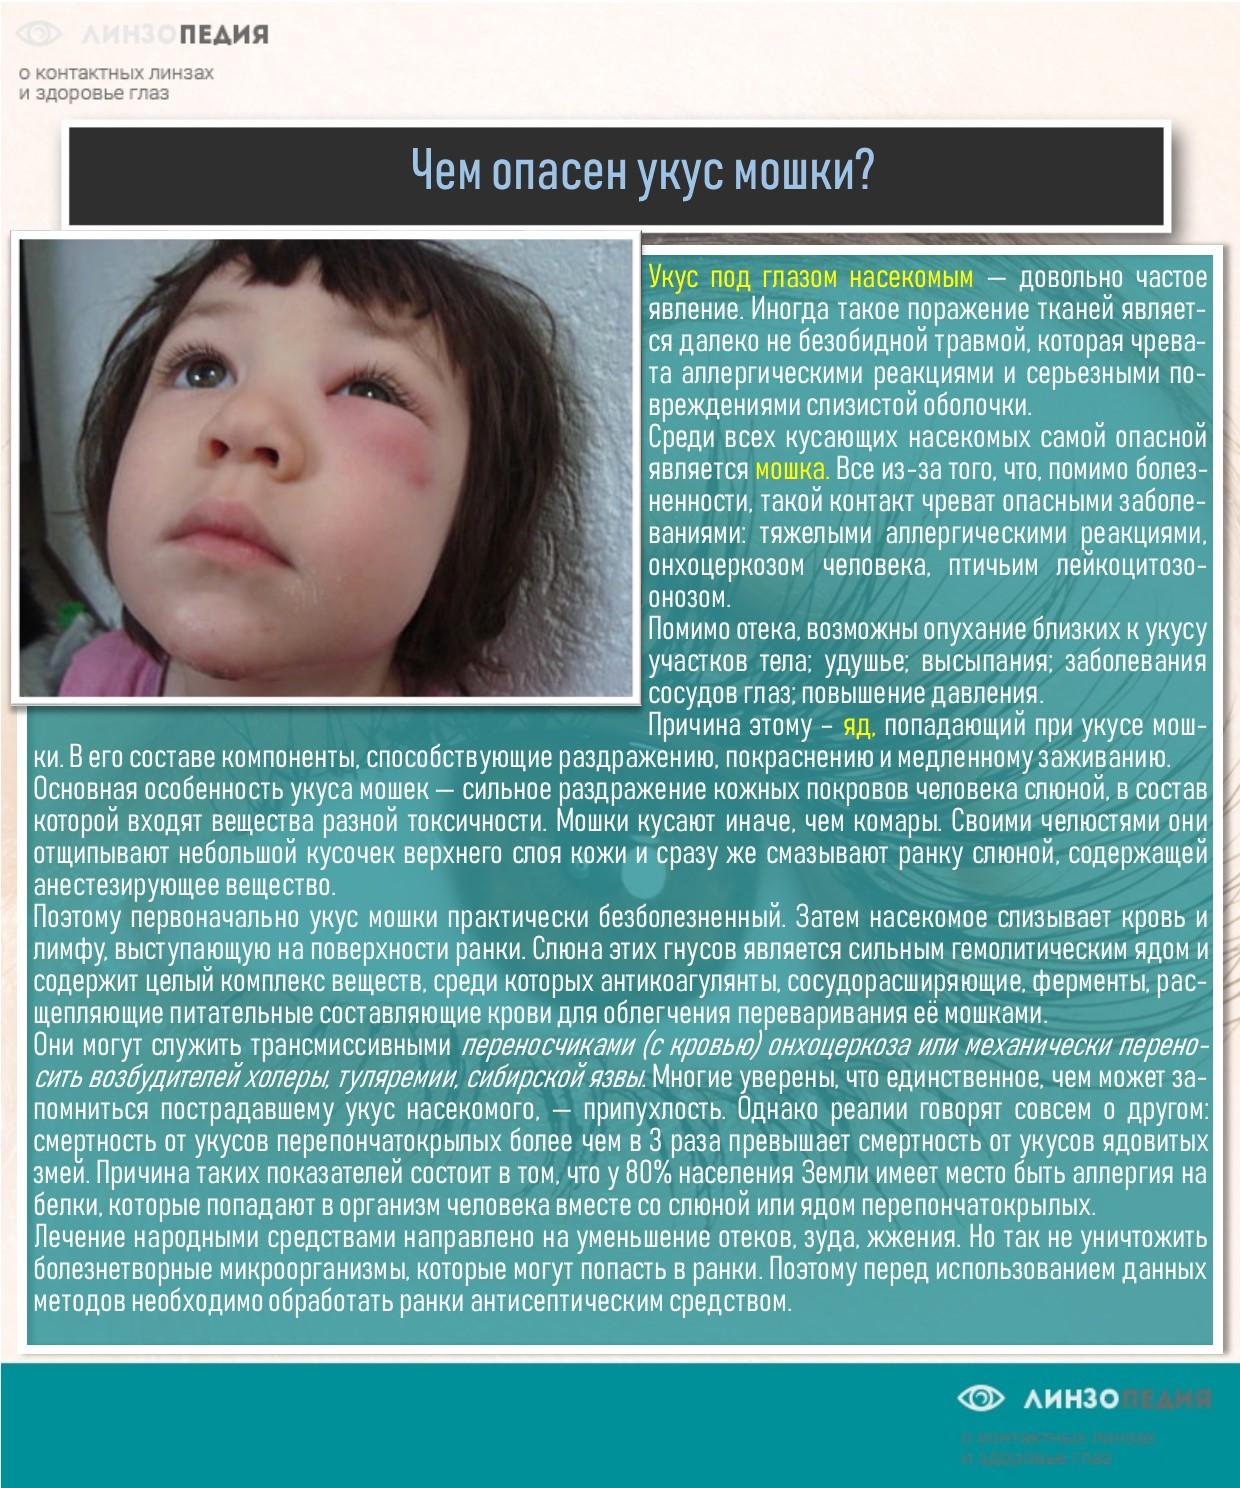 Чем опасен укус мошки под глазом?